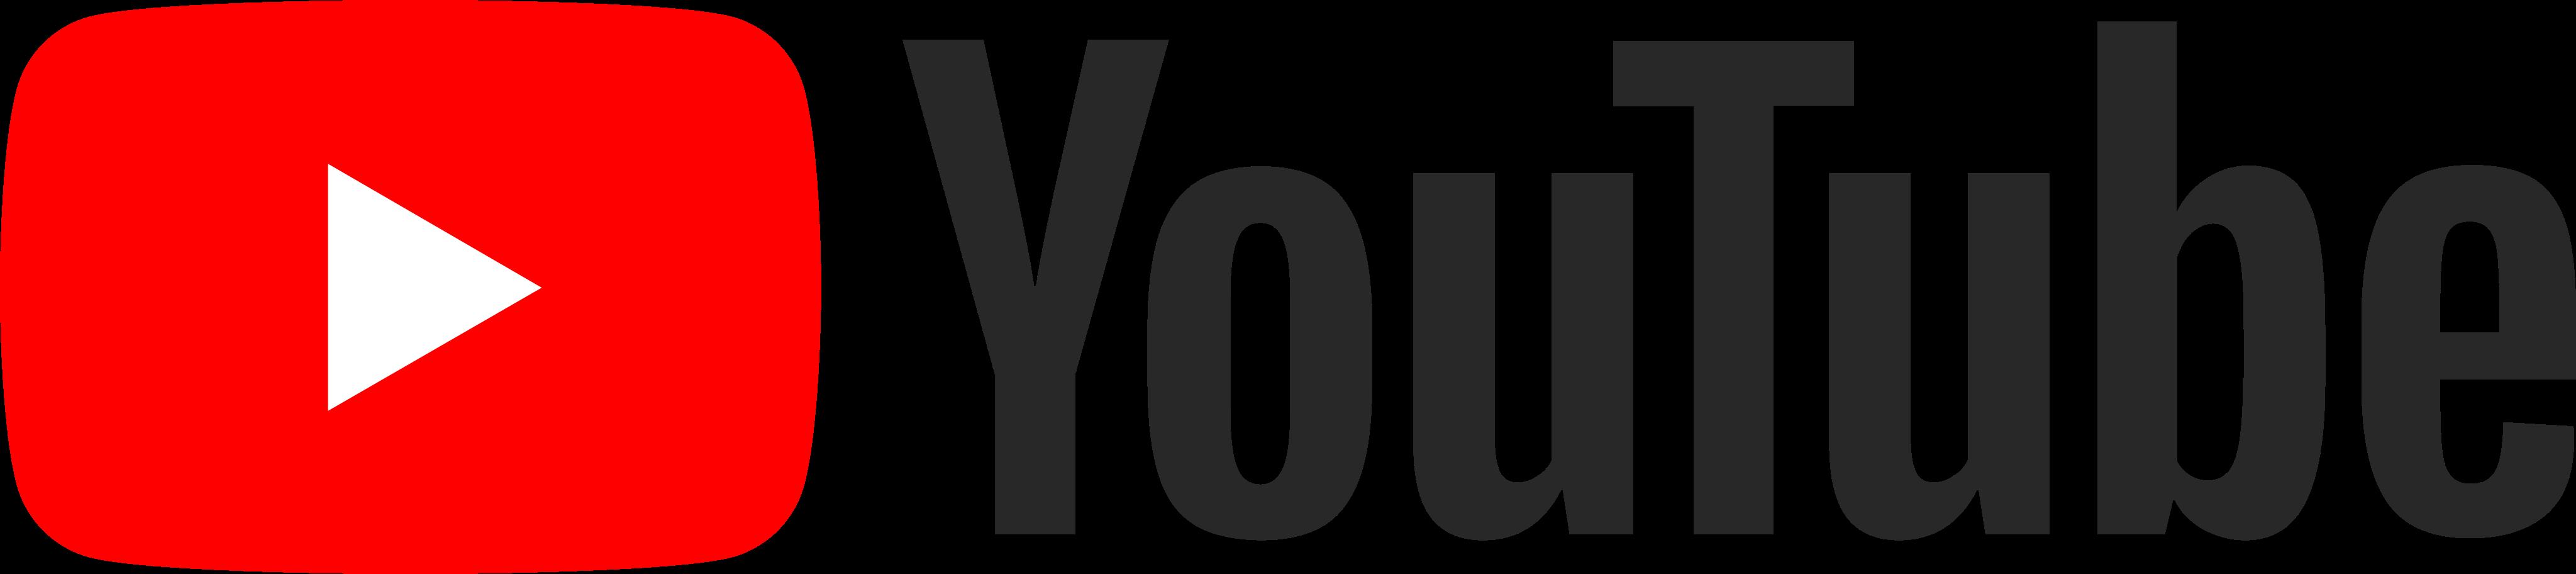 youtube-logo-9